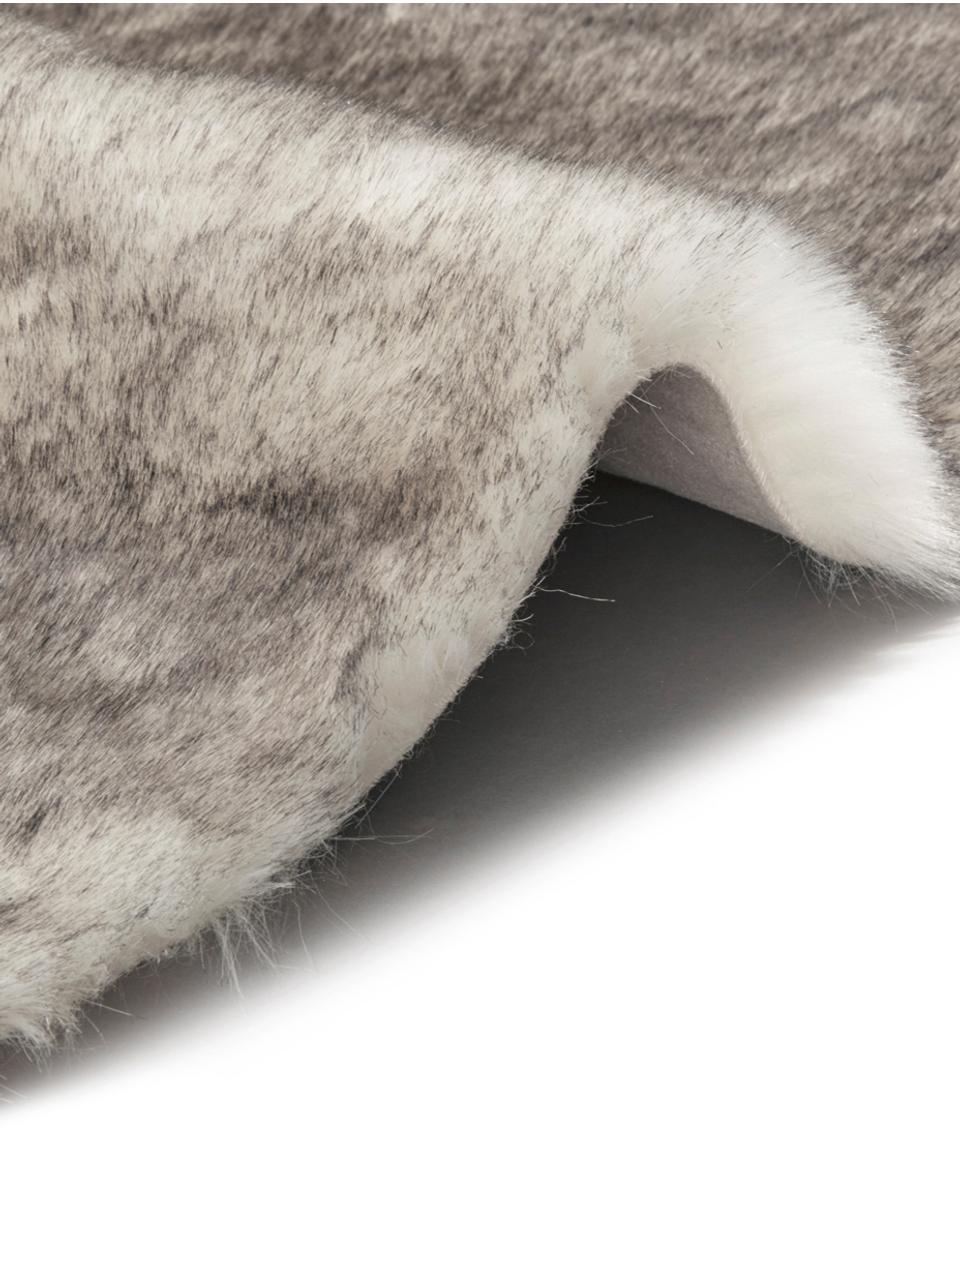 Alfombra de piel sintética Superior, Parte superior: 95%acrílico, 5%poliéste, Reverso: cuero sintético, Crema, beige, blanco, An 180 x L 280 cm (Tamaño M)